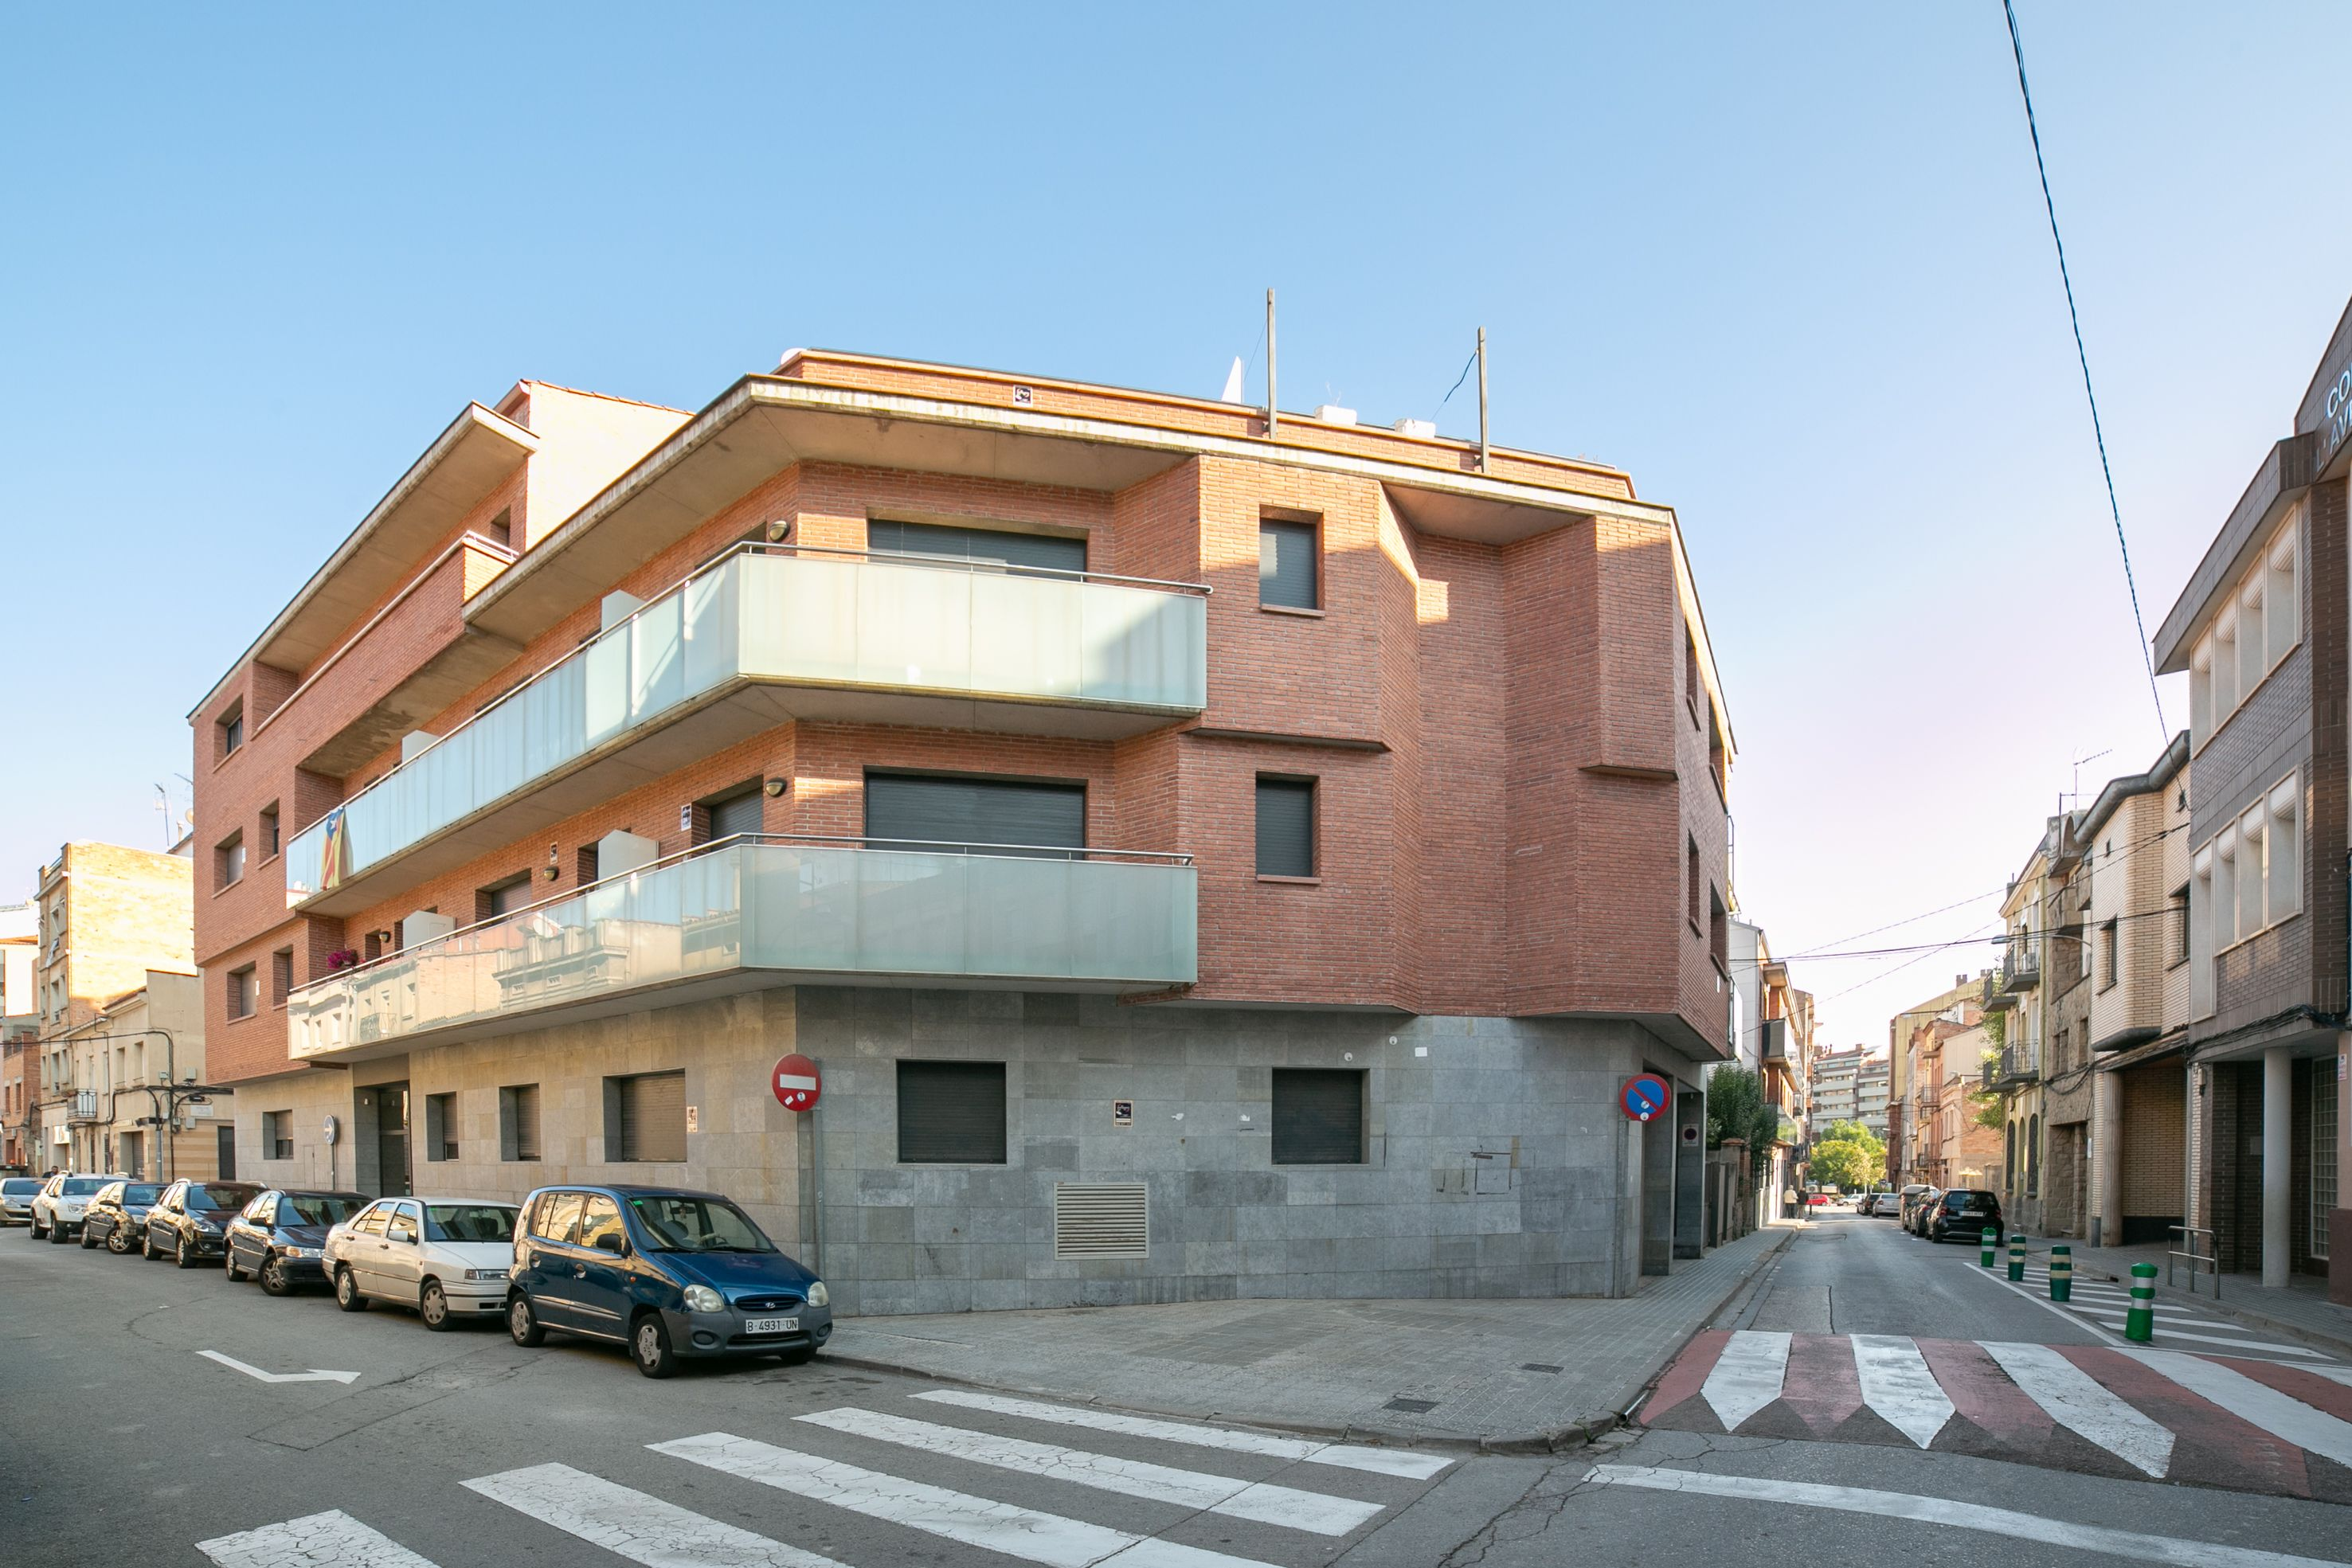 Local en venta en Poble Nou, Manresa, Barcelona, Calle Flor de Lis, 117.000 €, 165 m2